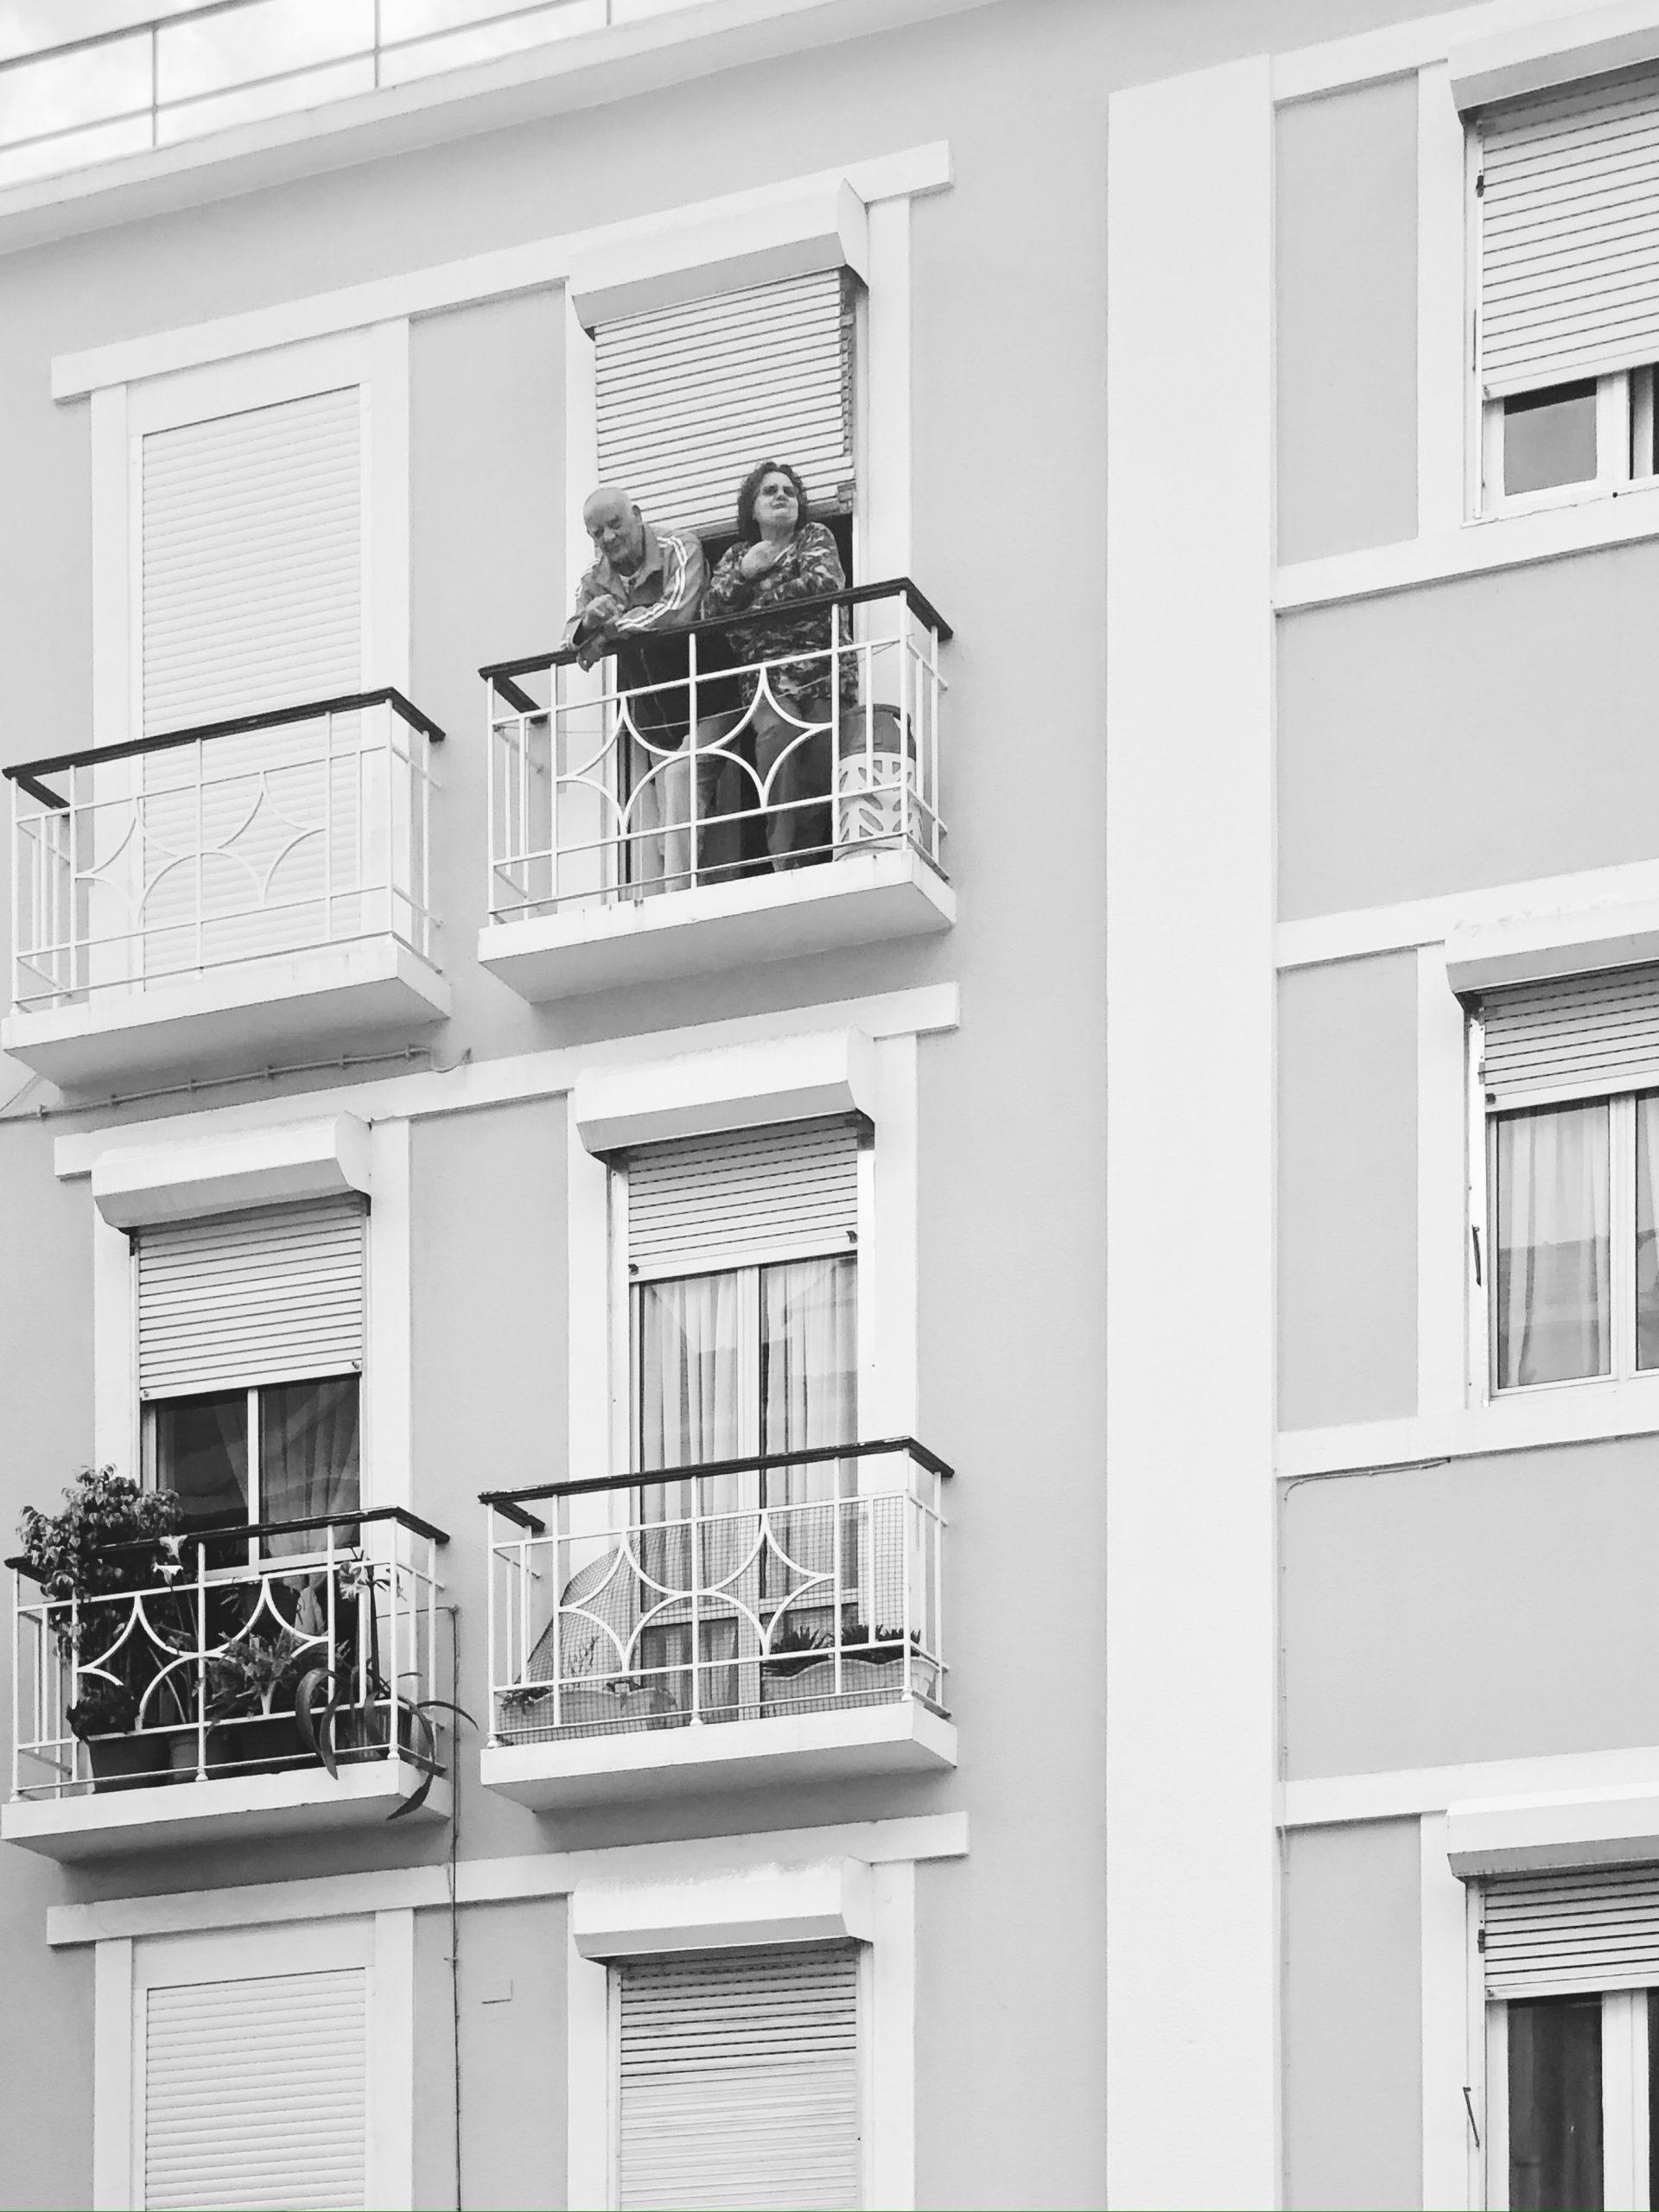 Rediscovering The Gift of Having Neighbors